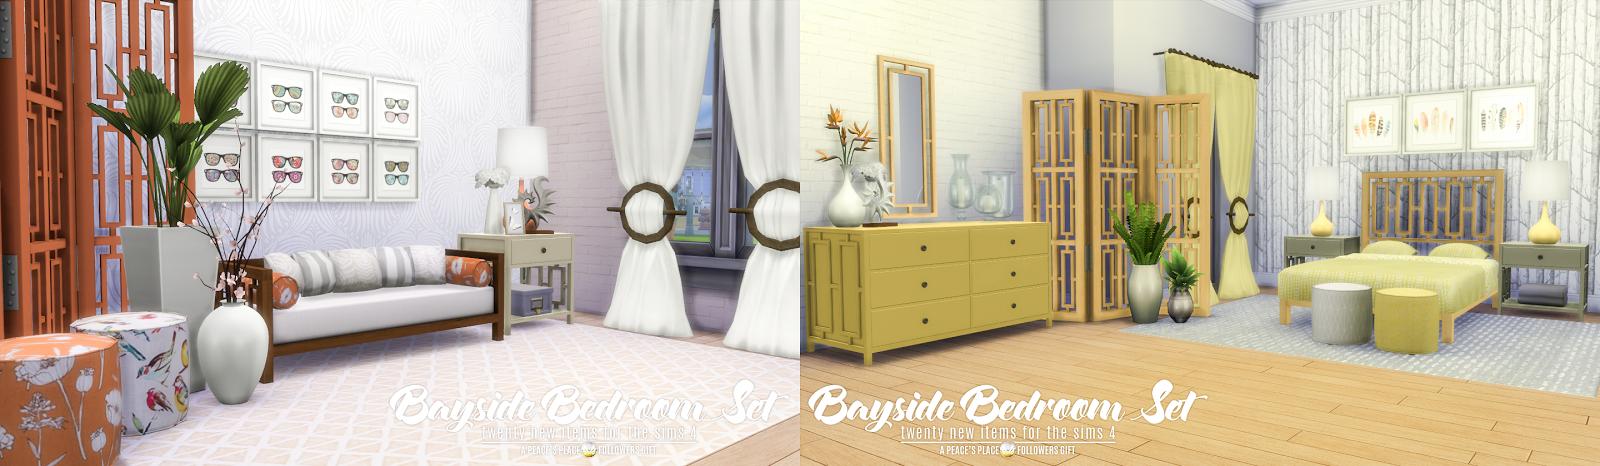 Simsational Designs Updated Bayside Bedroom Set